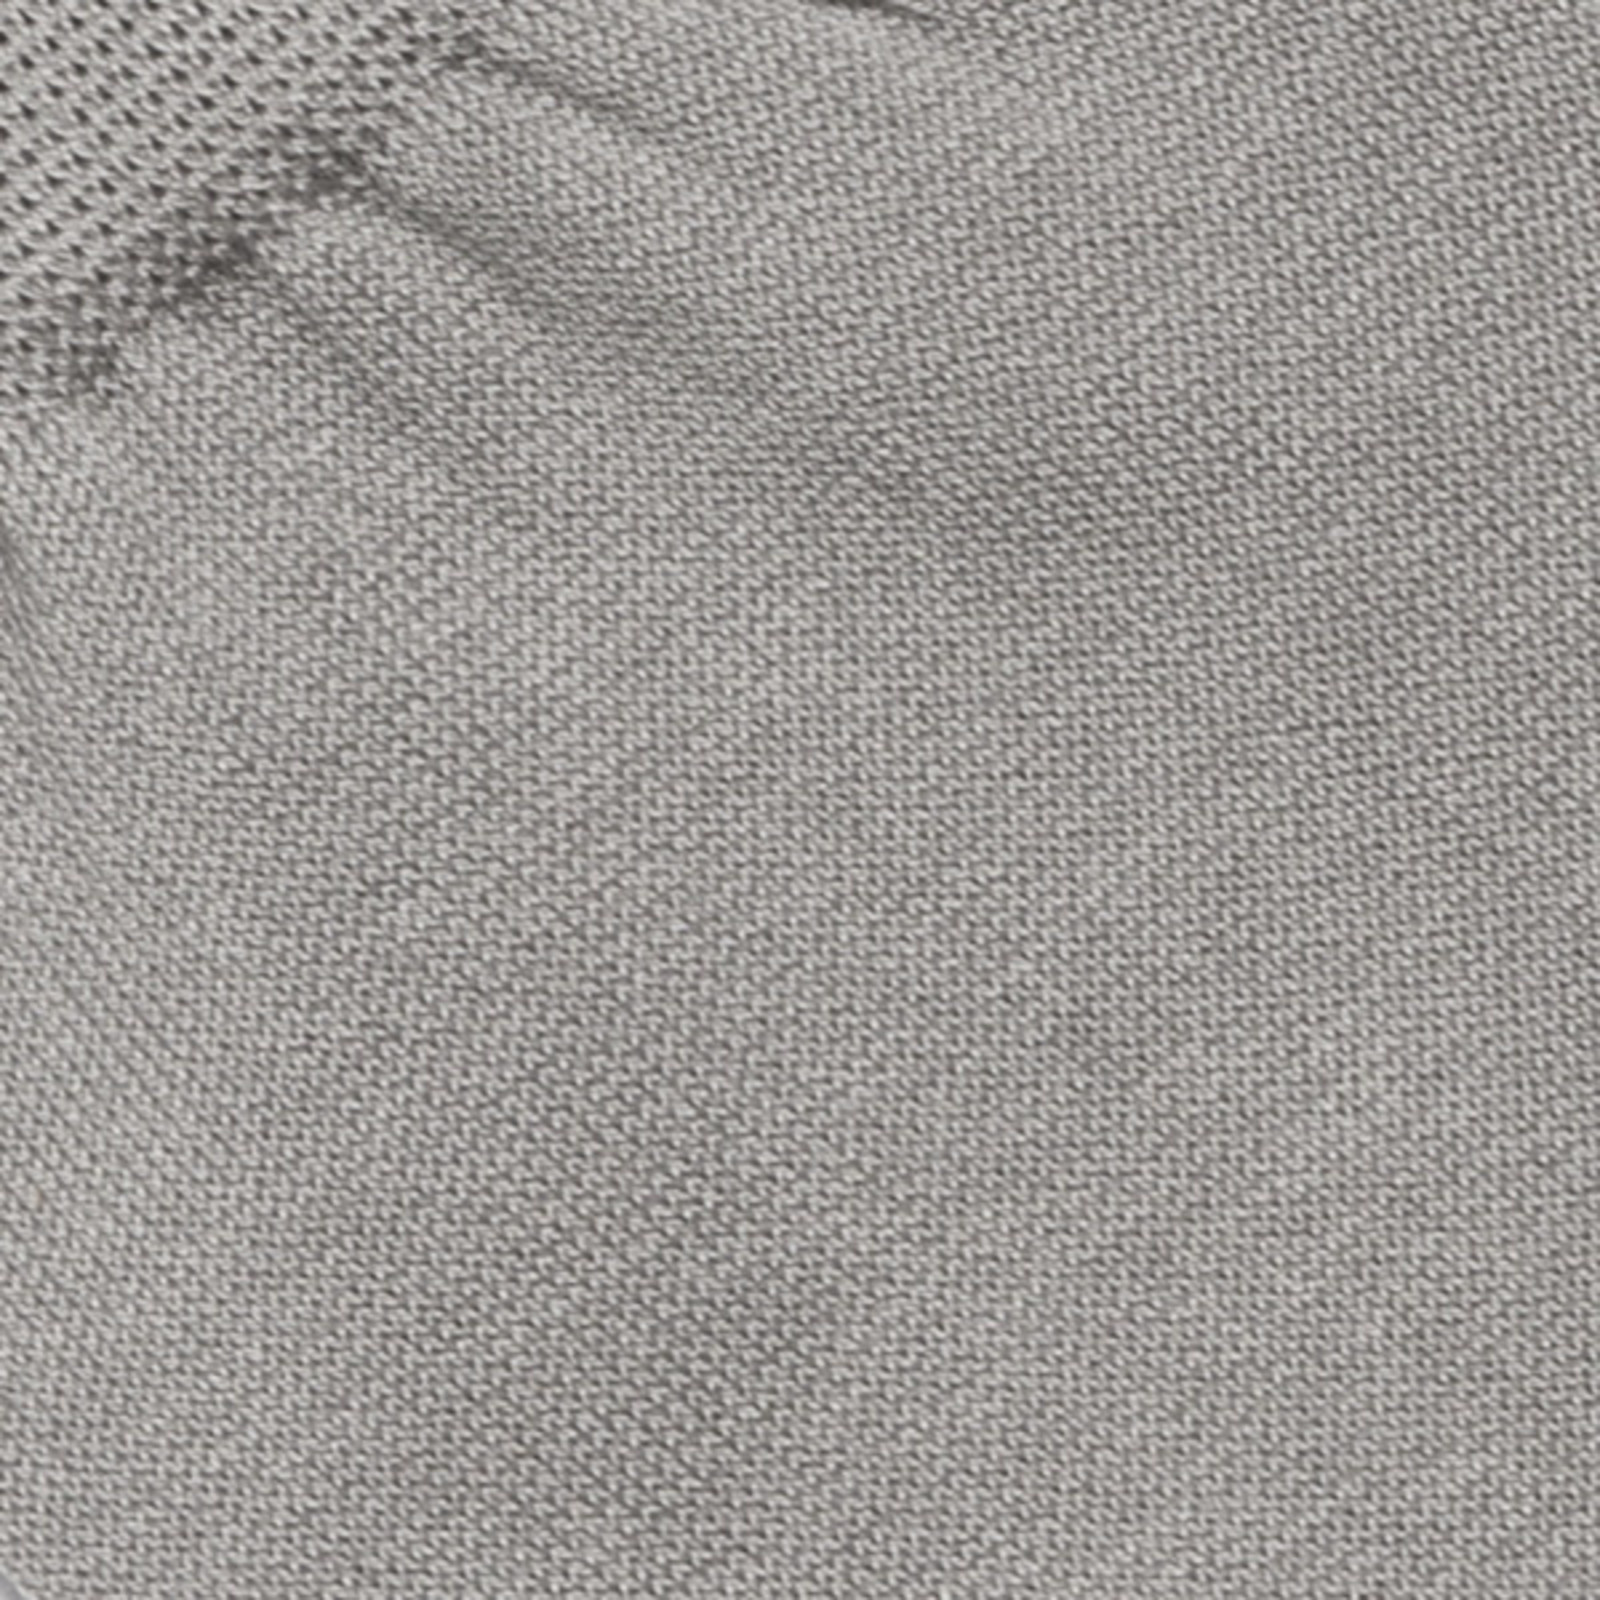 Carlo Lanza Hellgraue Socken Baumwolle